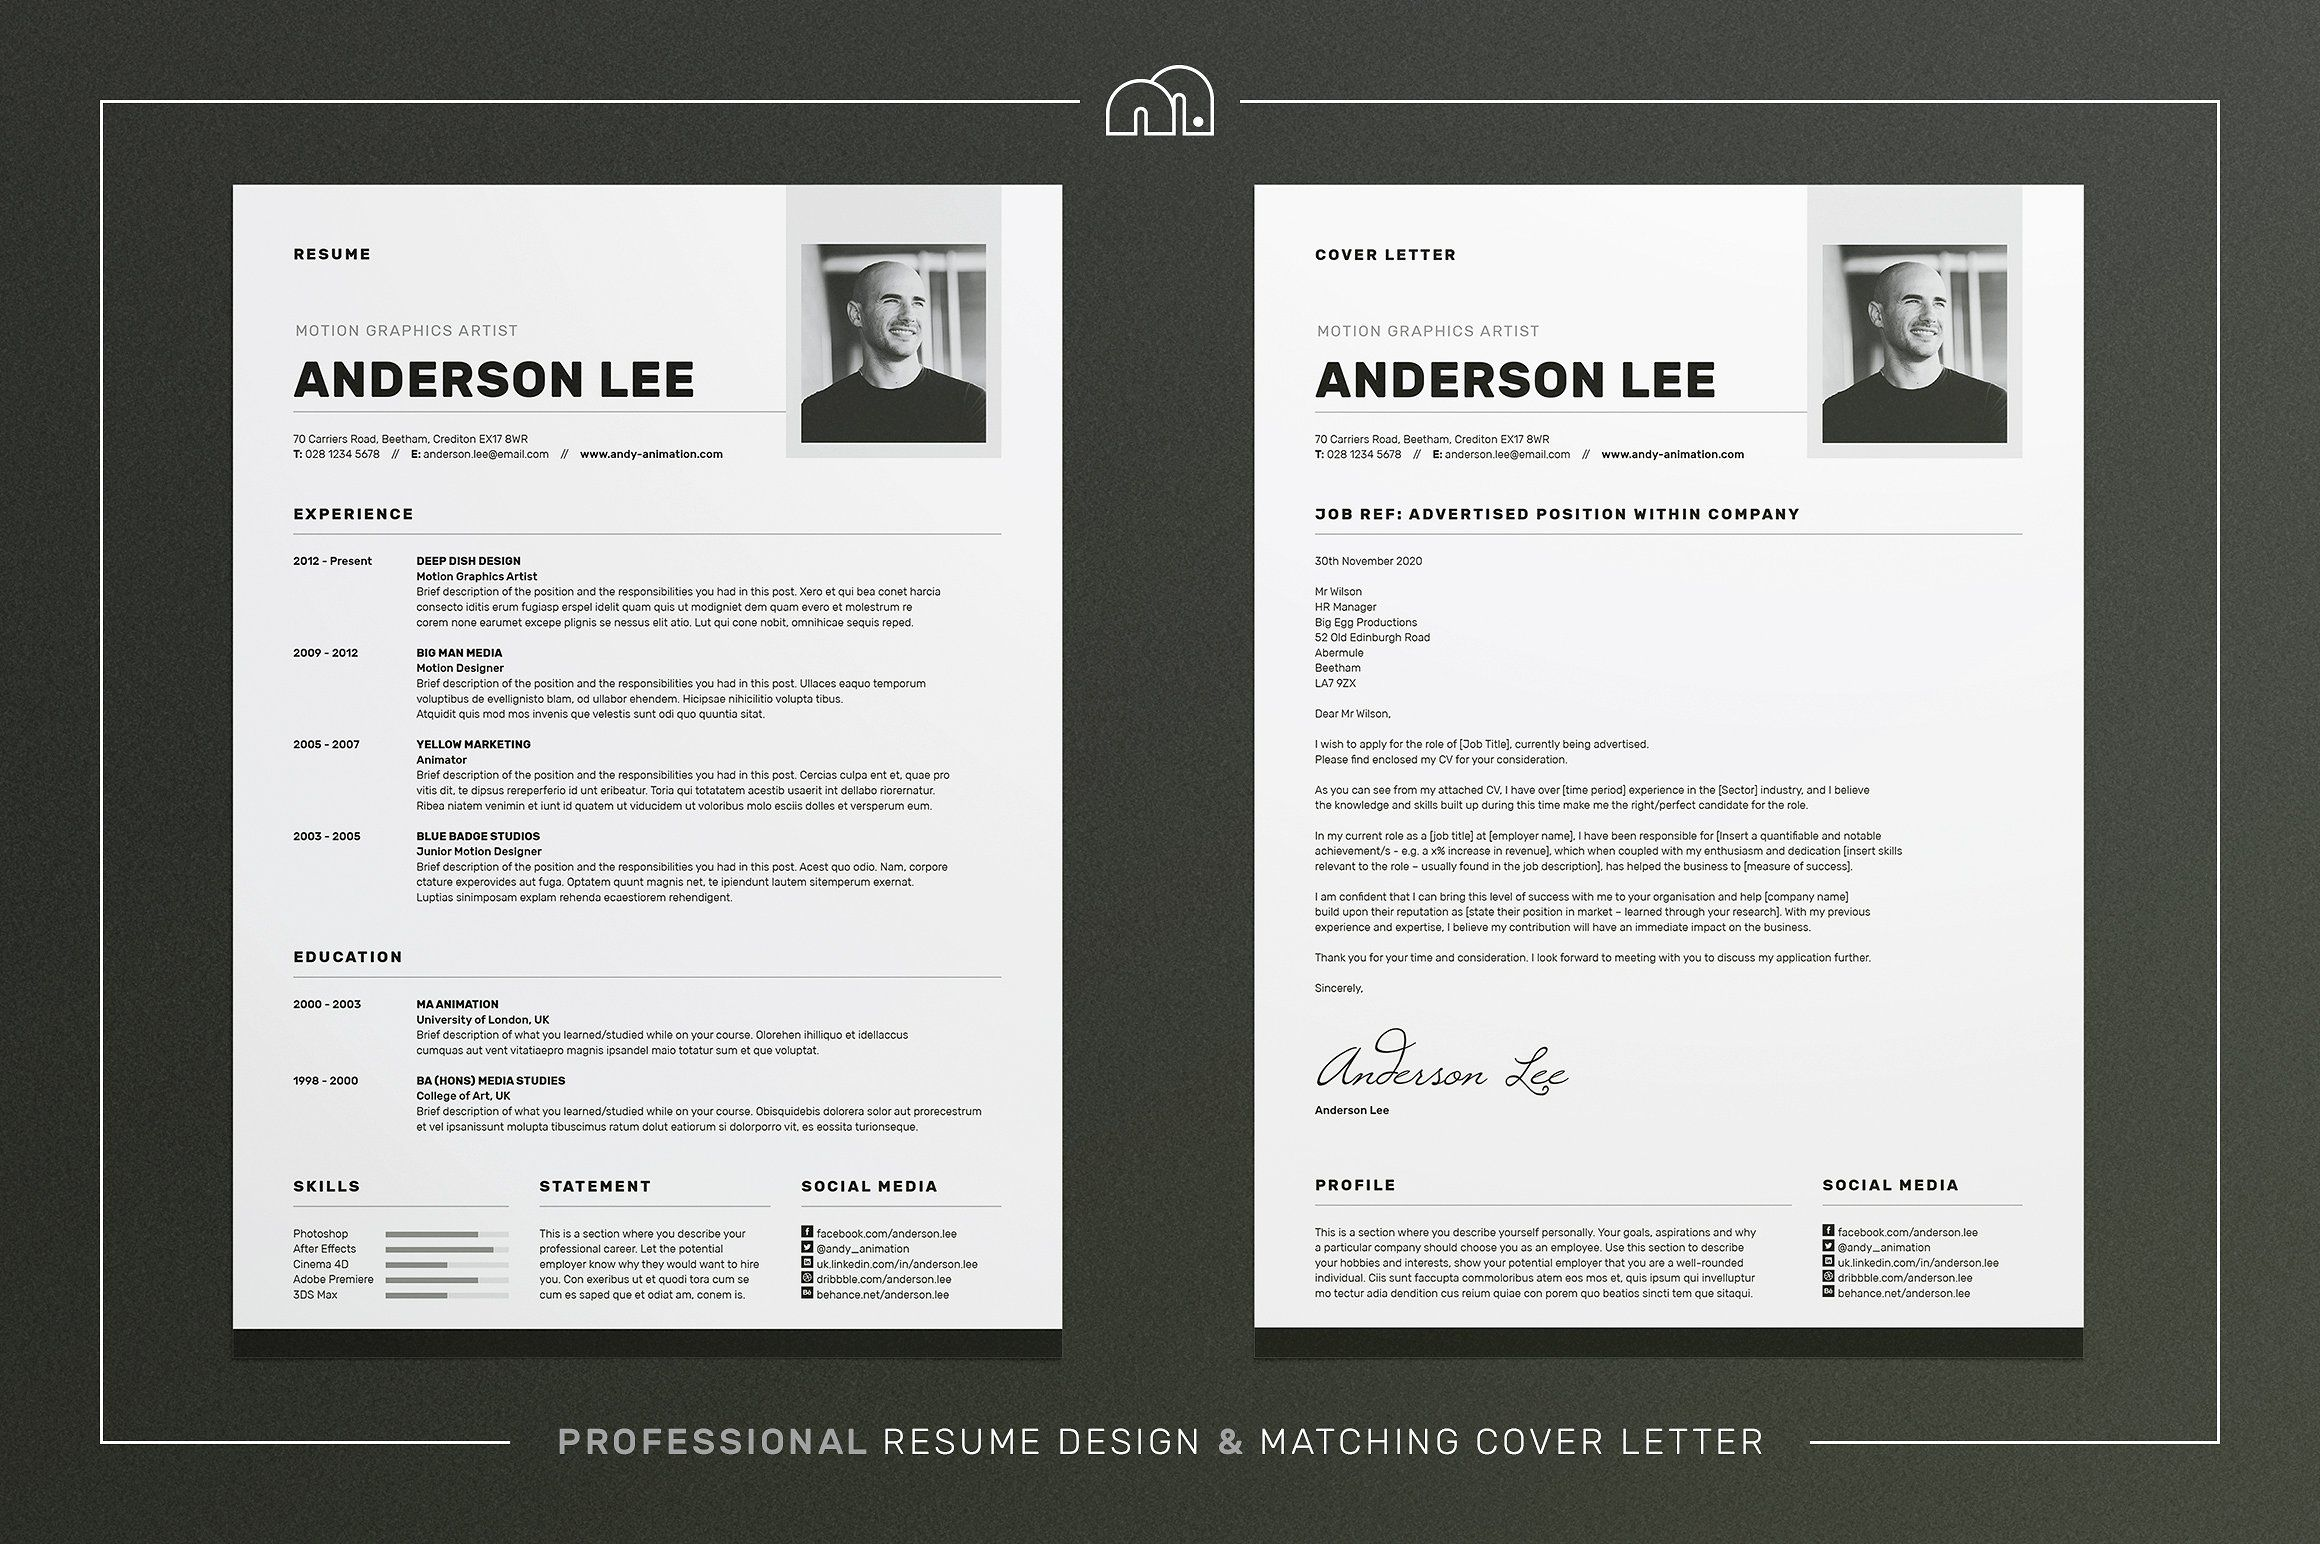 Resume CV Anderson Pinterest